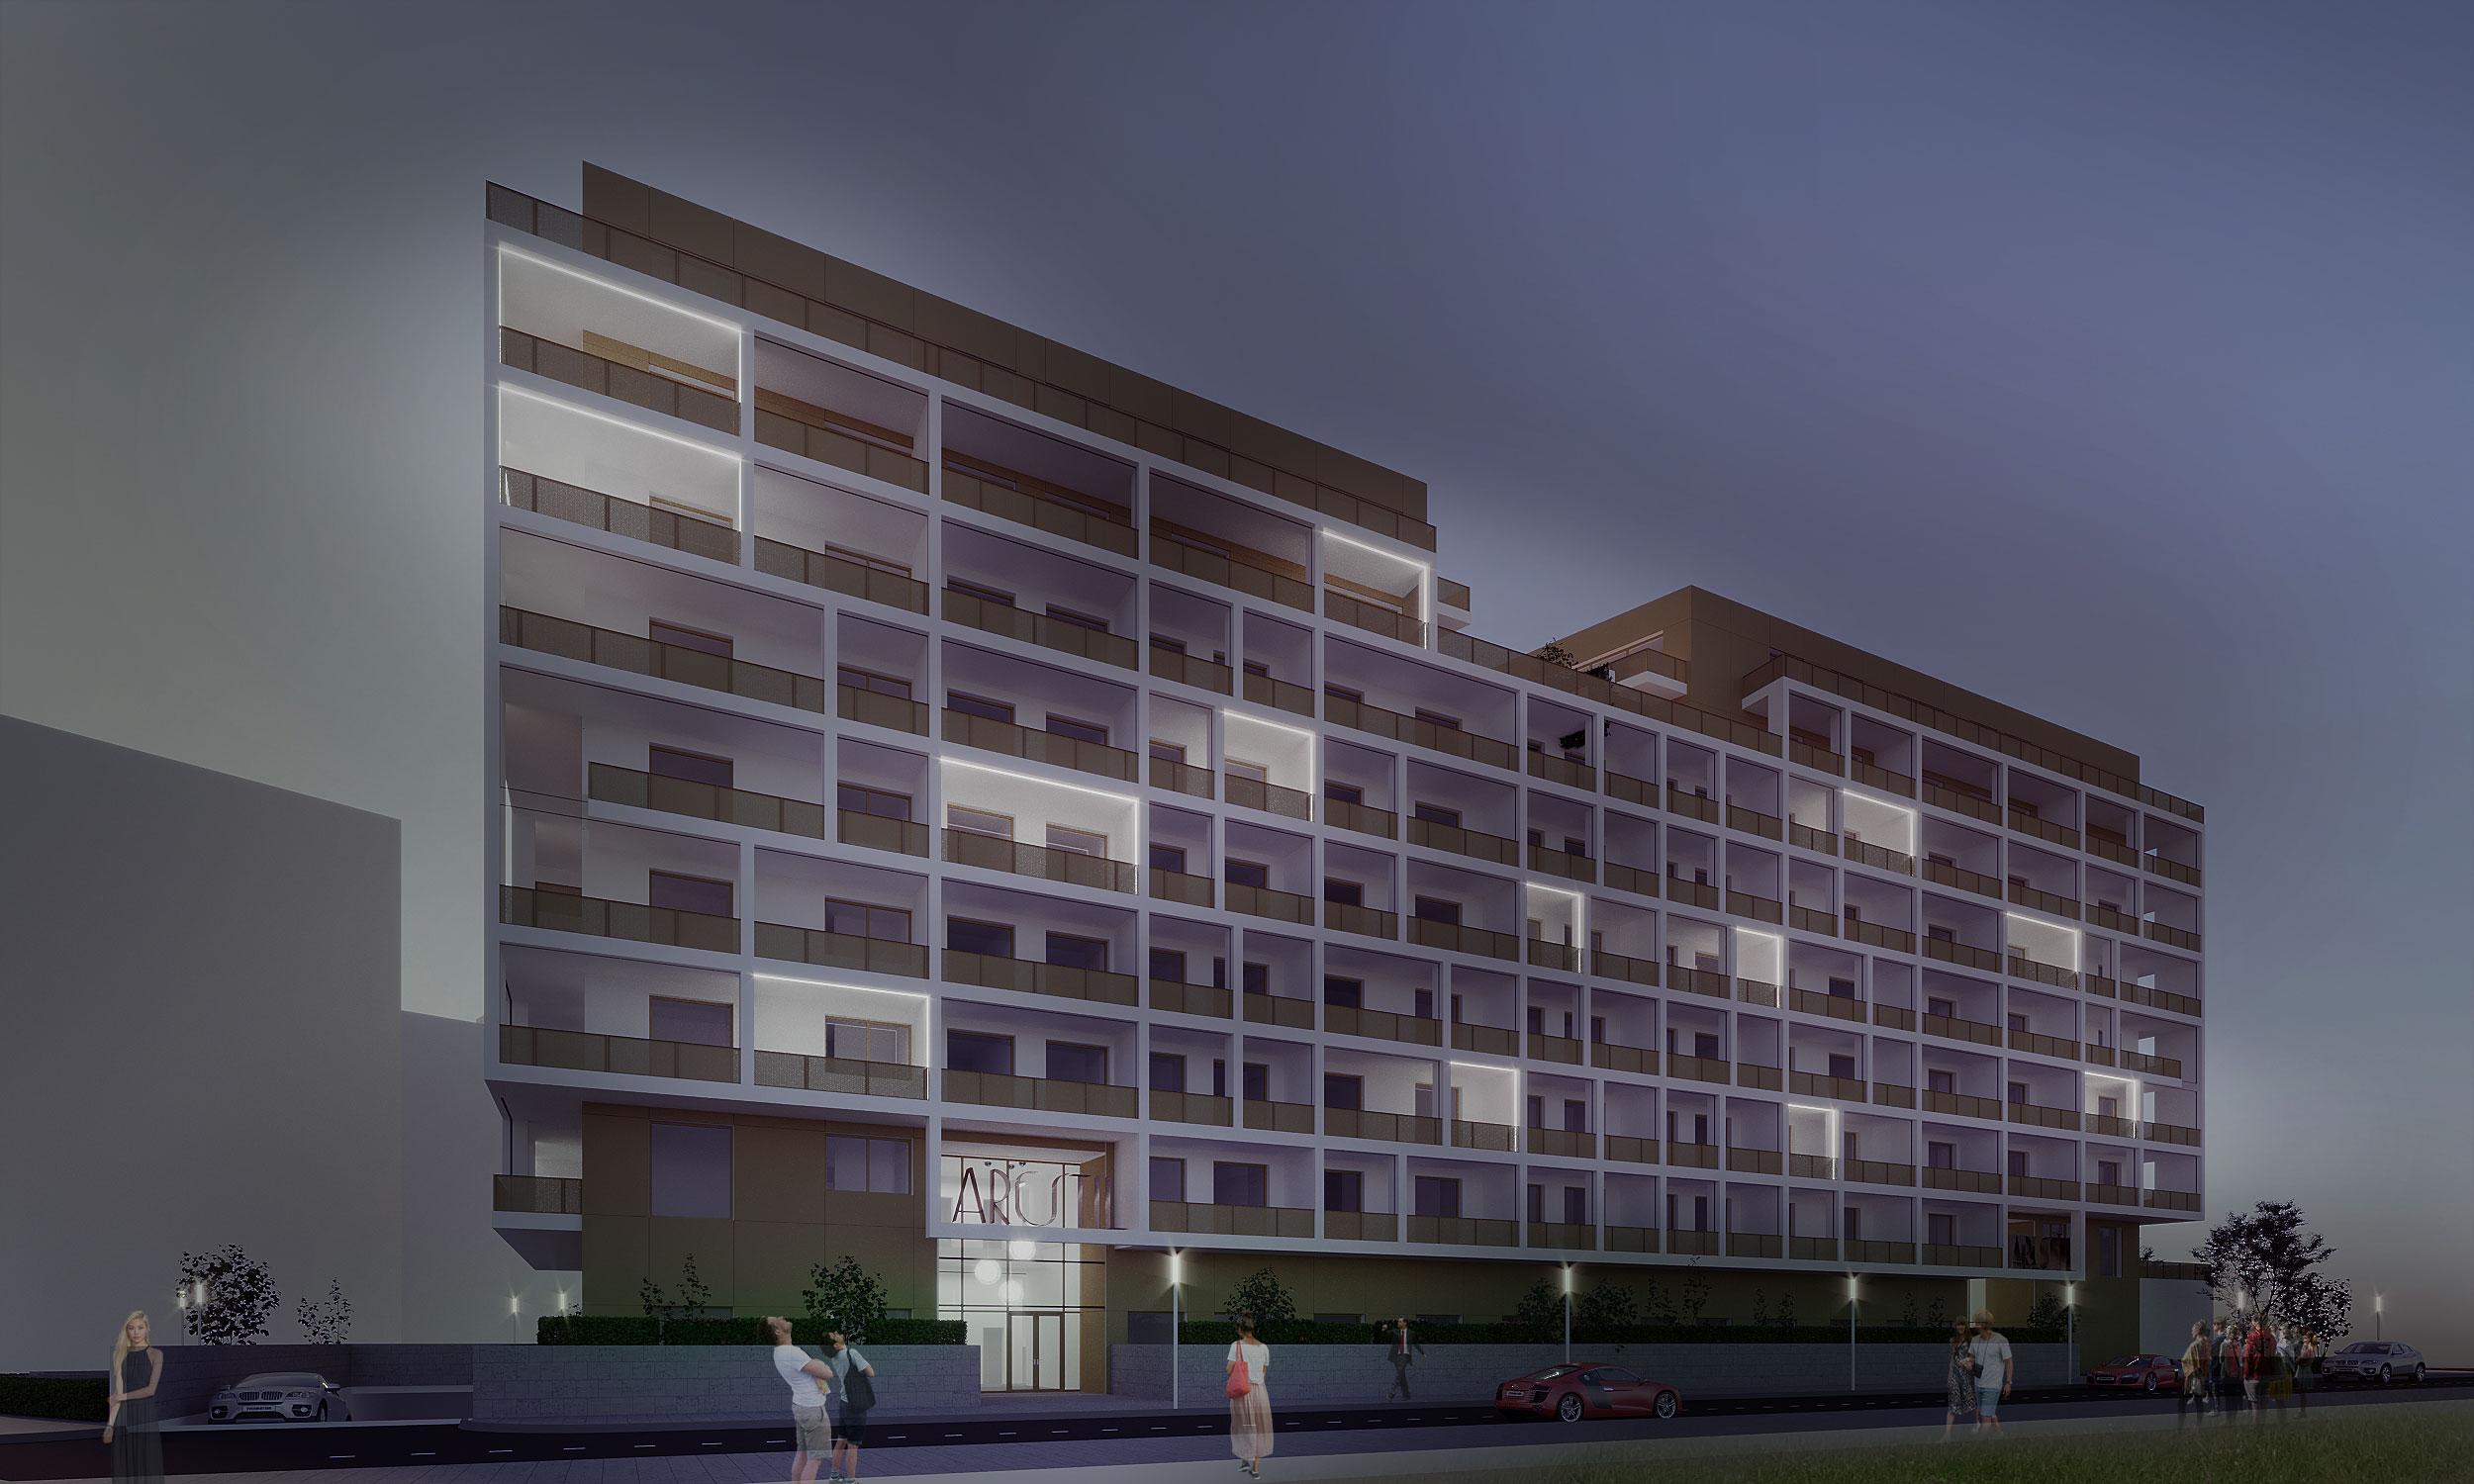 https://nbc-arhitect.ro/wp-content/uploads/2020/10/NBC-Arhitect-_-Glucoza-Residence-_-Bucharest-Romania-_-exterior-view_6.jpg